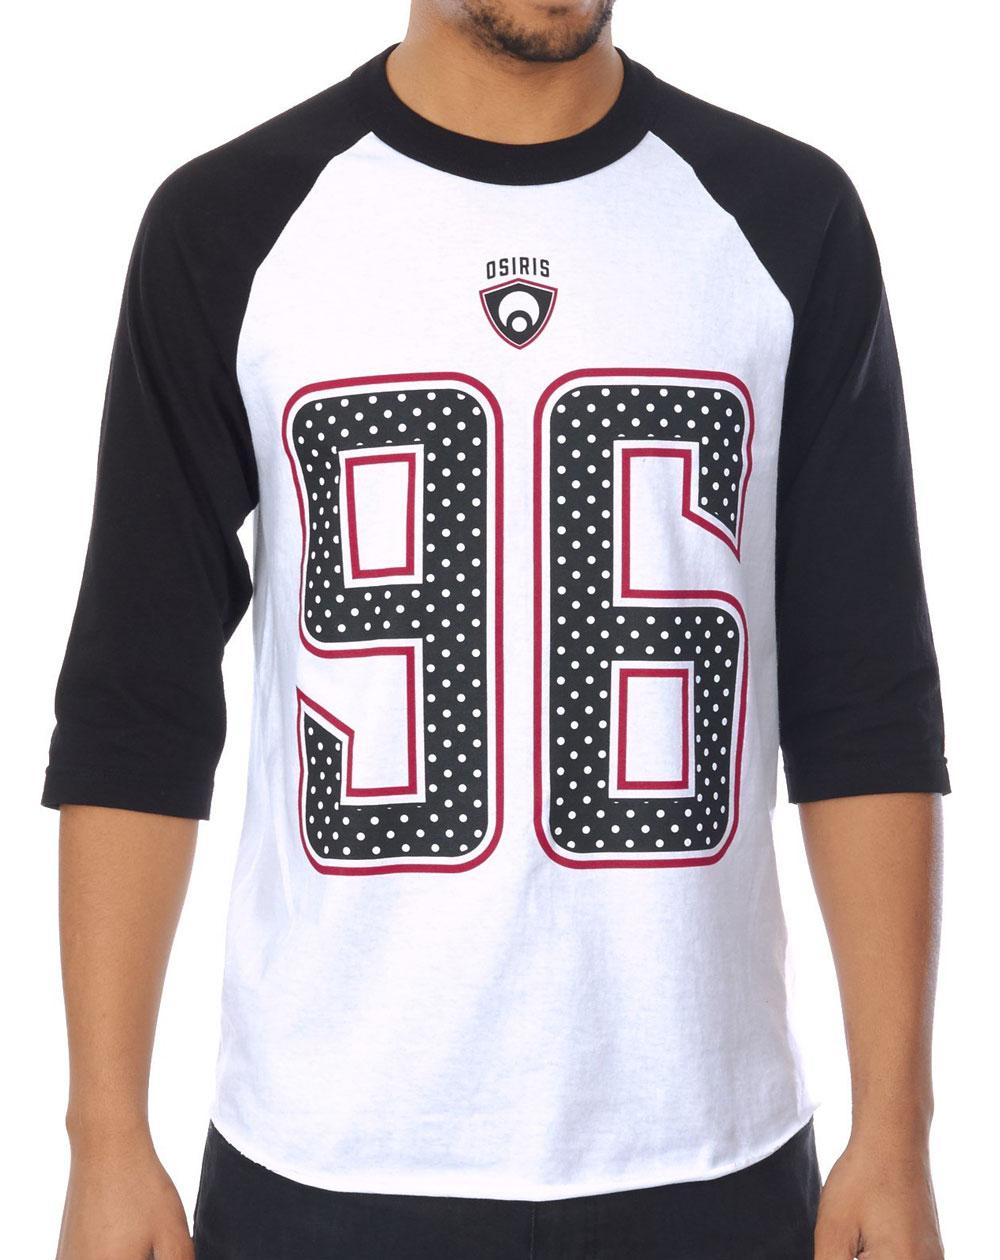 Osiris Men's T-Shirt Game Day Black/White